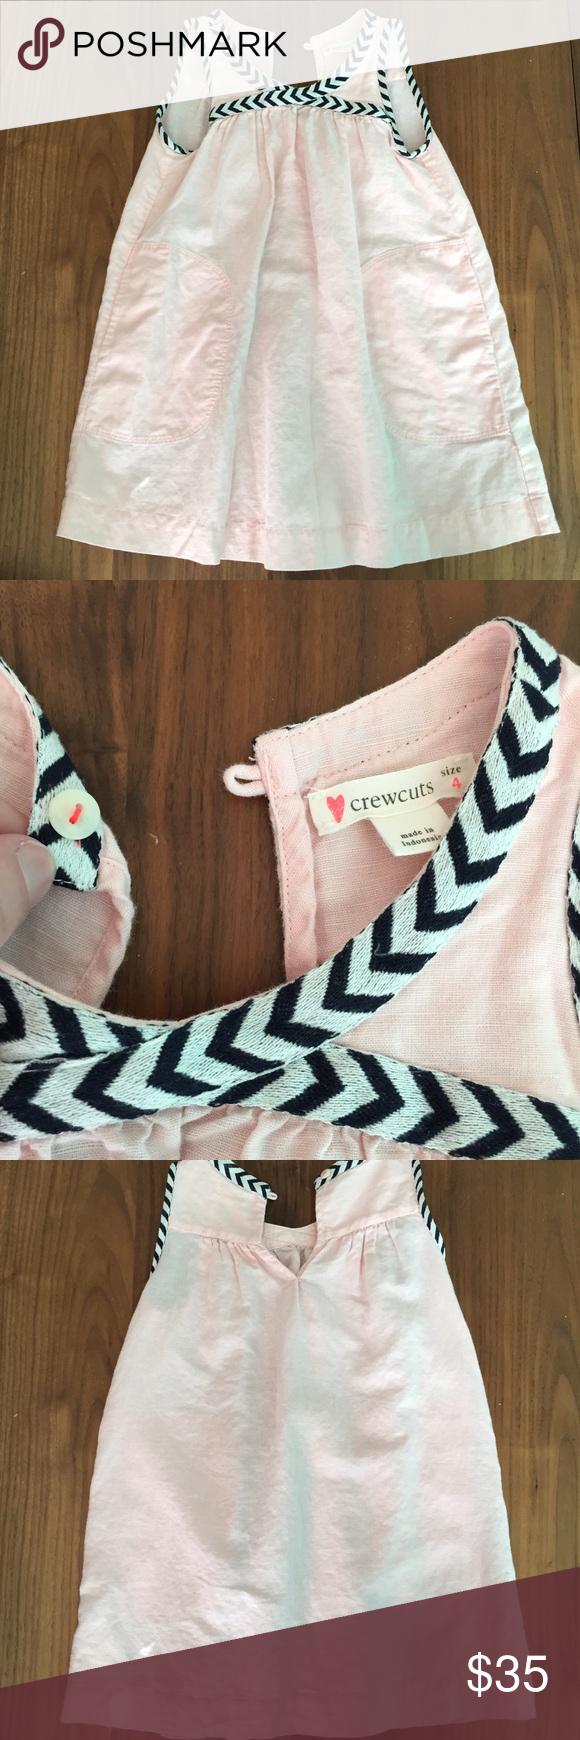 Crewcuts Toddler dress Crewcuts Toddler Dress.  Pale pink dress (60% linen 40% cotton), black and white chevron trim, front pockets, button closure, knee length.  Great condition, so cute! J. Crew Dresses